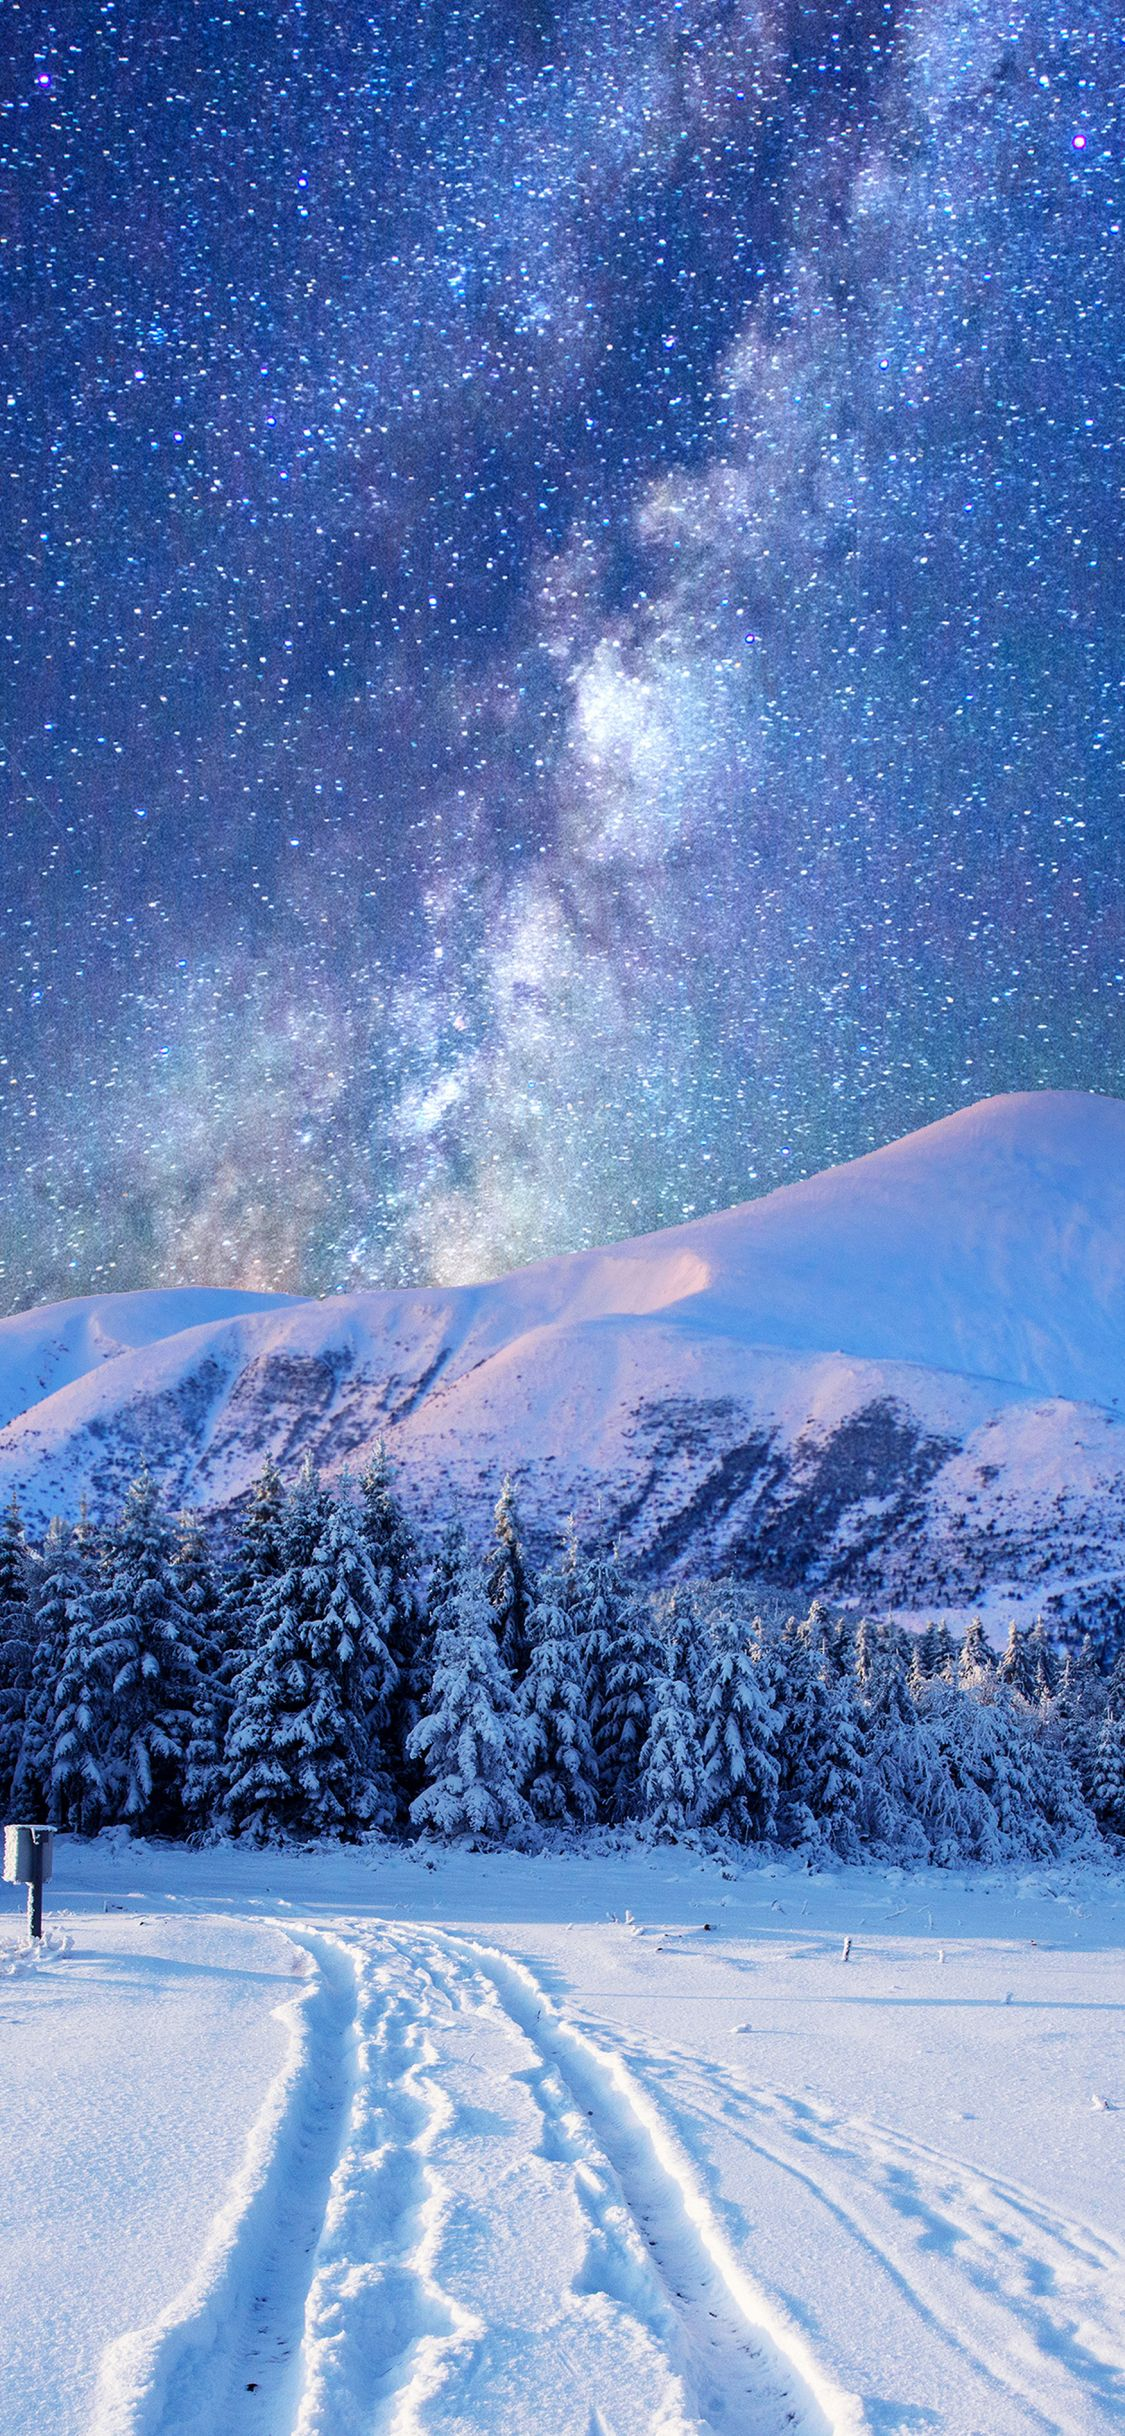 Starry Sky over Winter Landscape Mobile Wallpaper in 2020